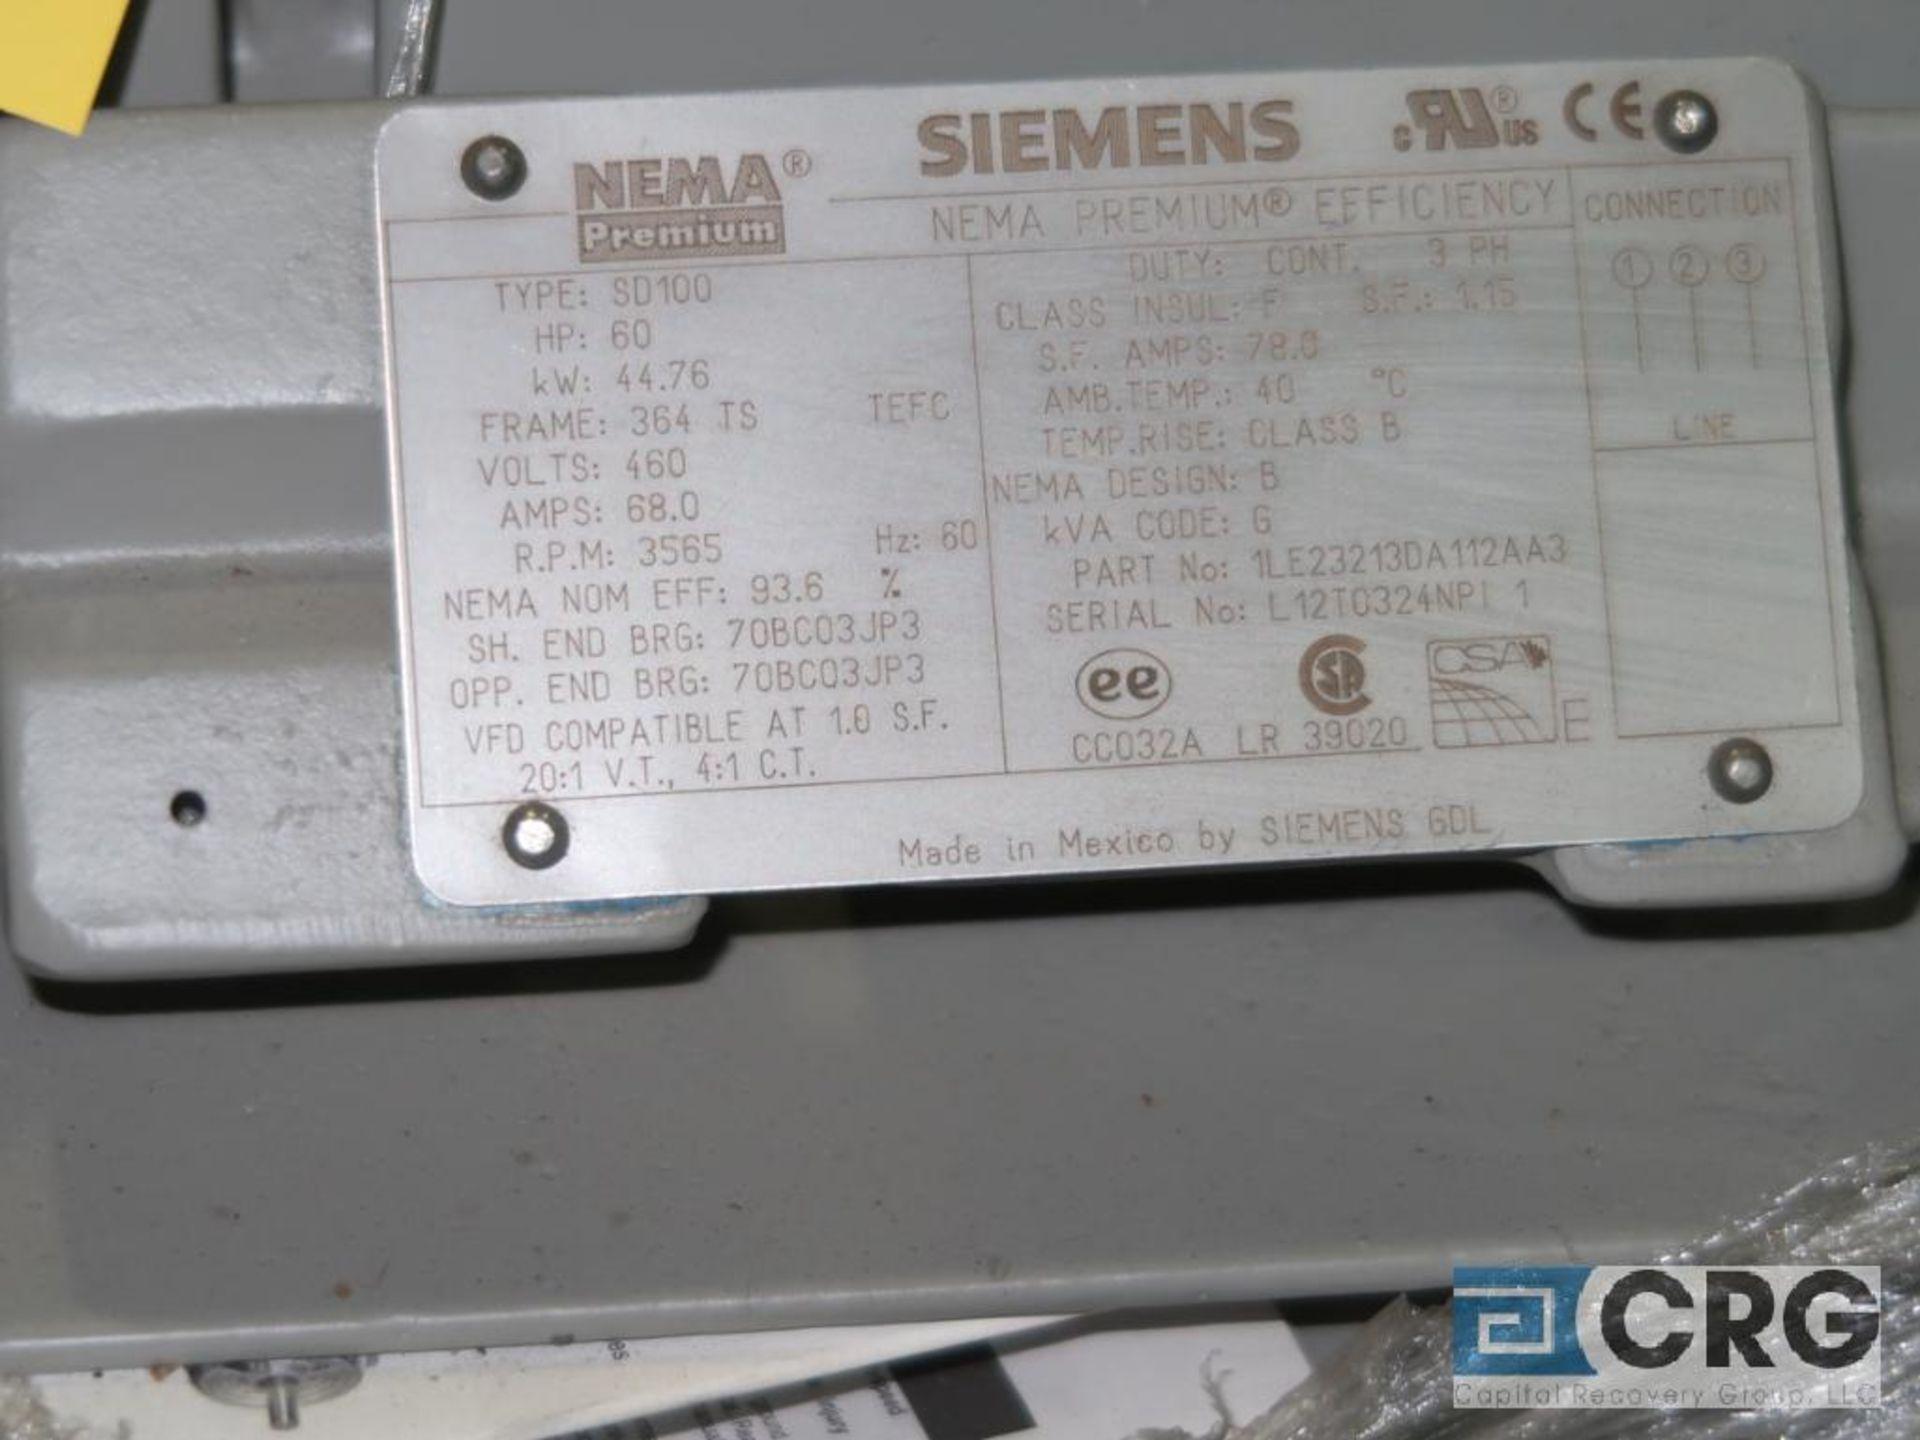 Siemens NEMA Premium Efficiency motor, 60 HP, 3,565 RPMs, 460 volt, 3 ph., 364TS frame (Finish - Image 2 of 2